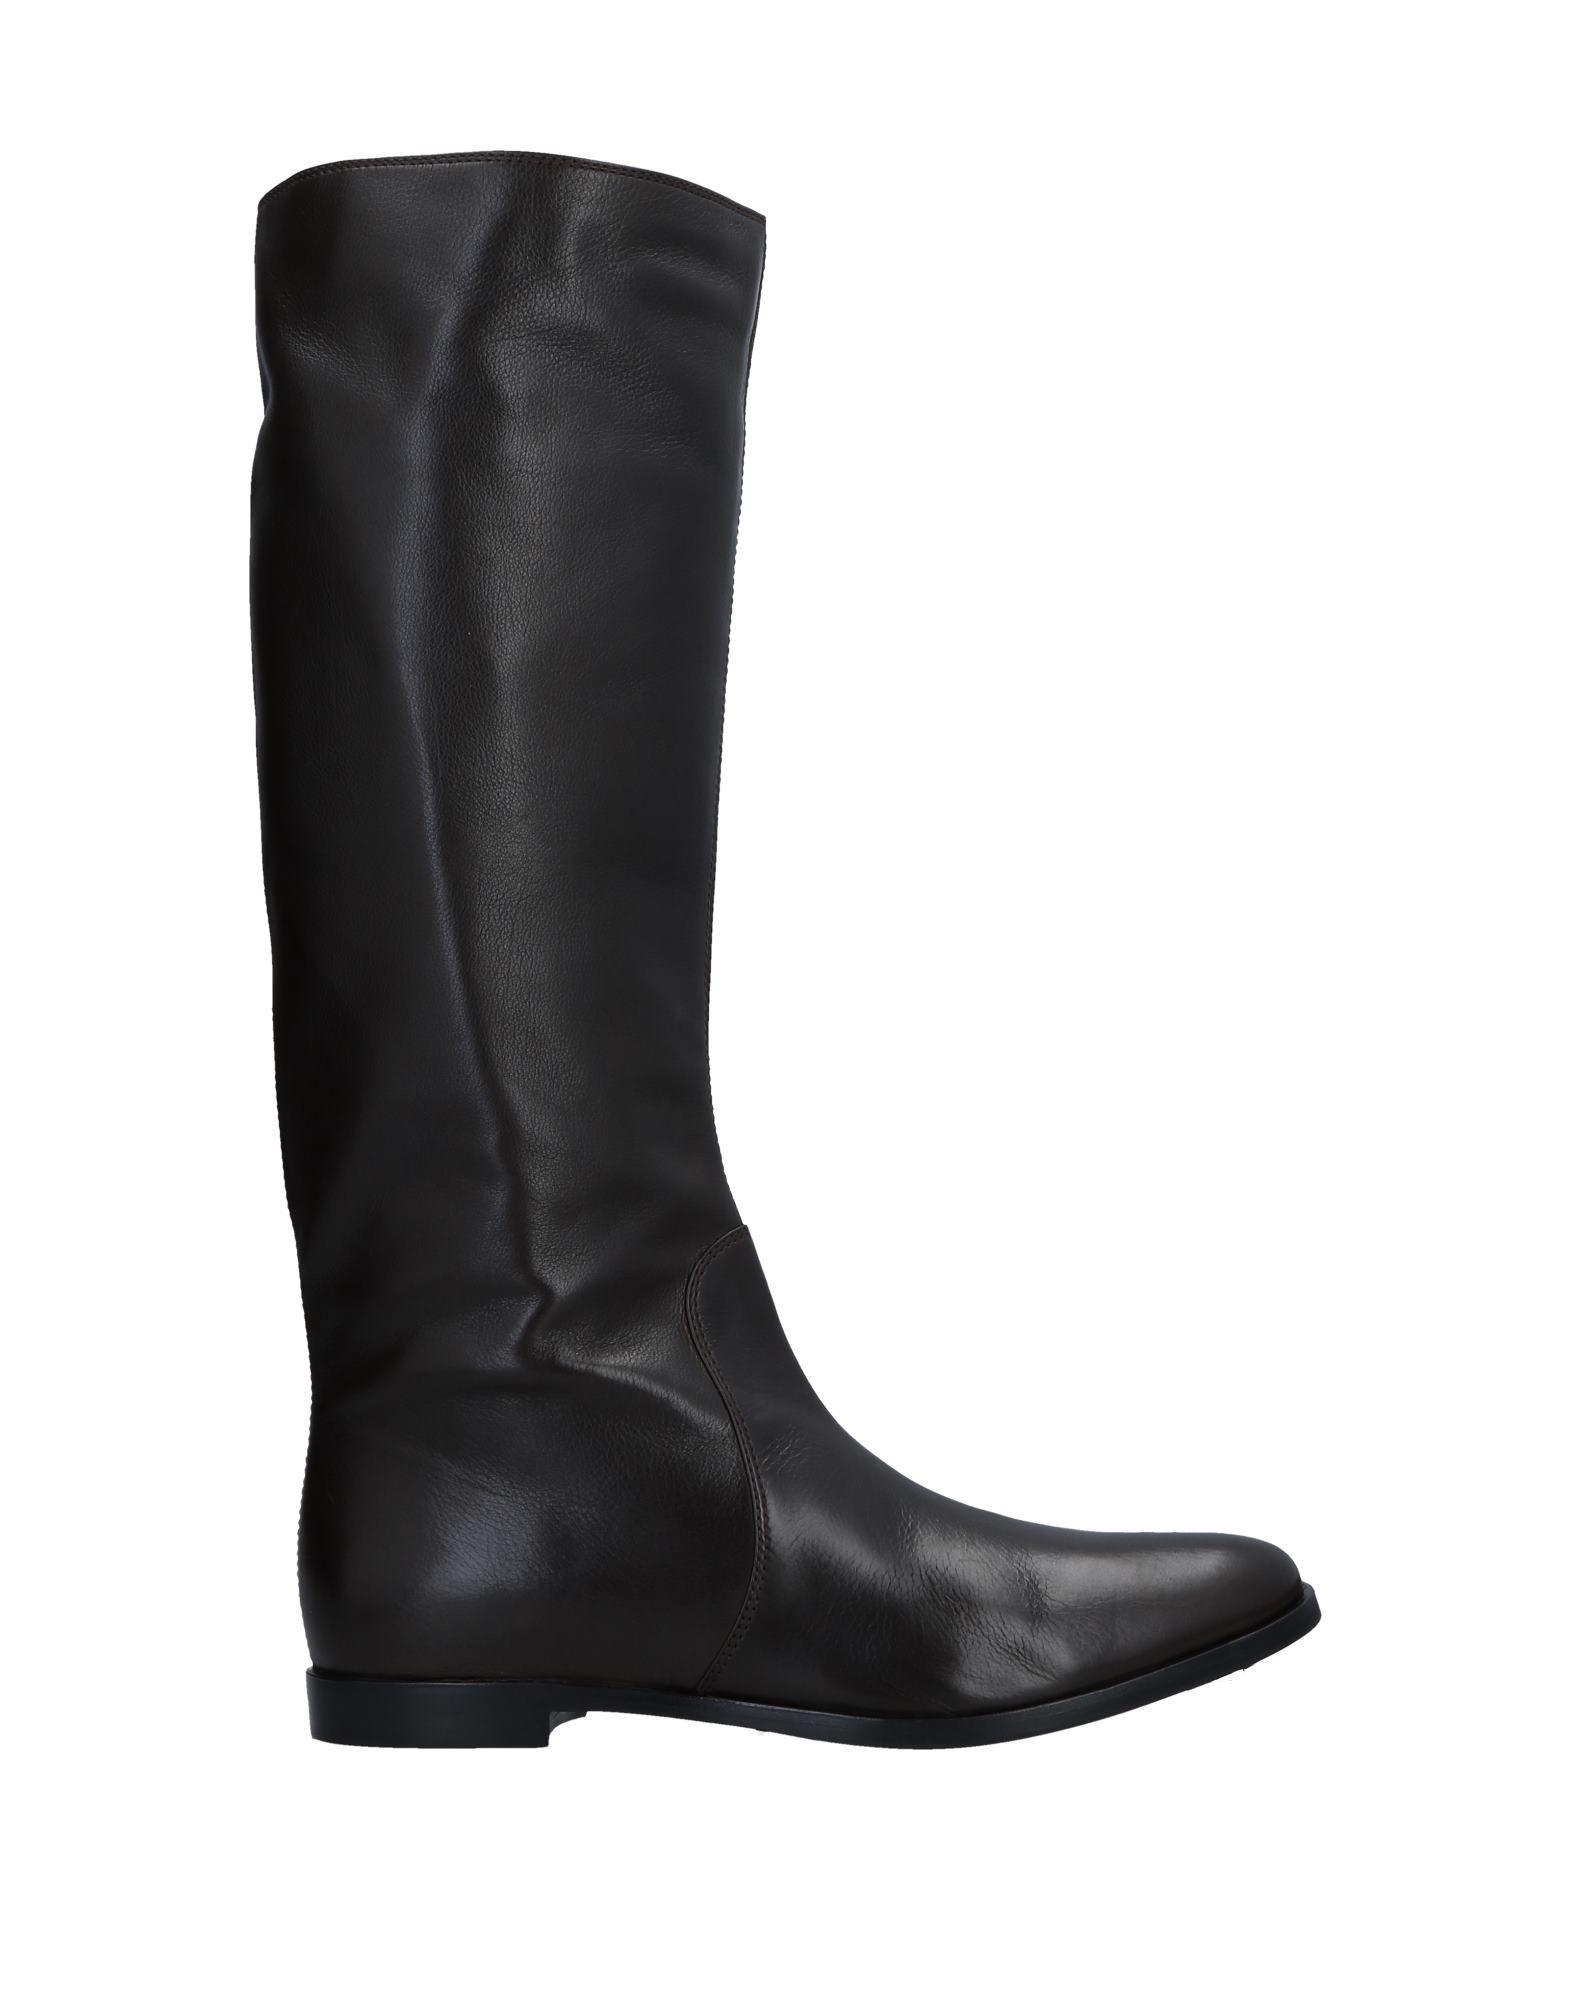 Sergio Rossi Boots - Women Sergio Rossi United Boots online on  United Rossi Kingdom - 11526103LH 03c766